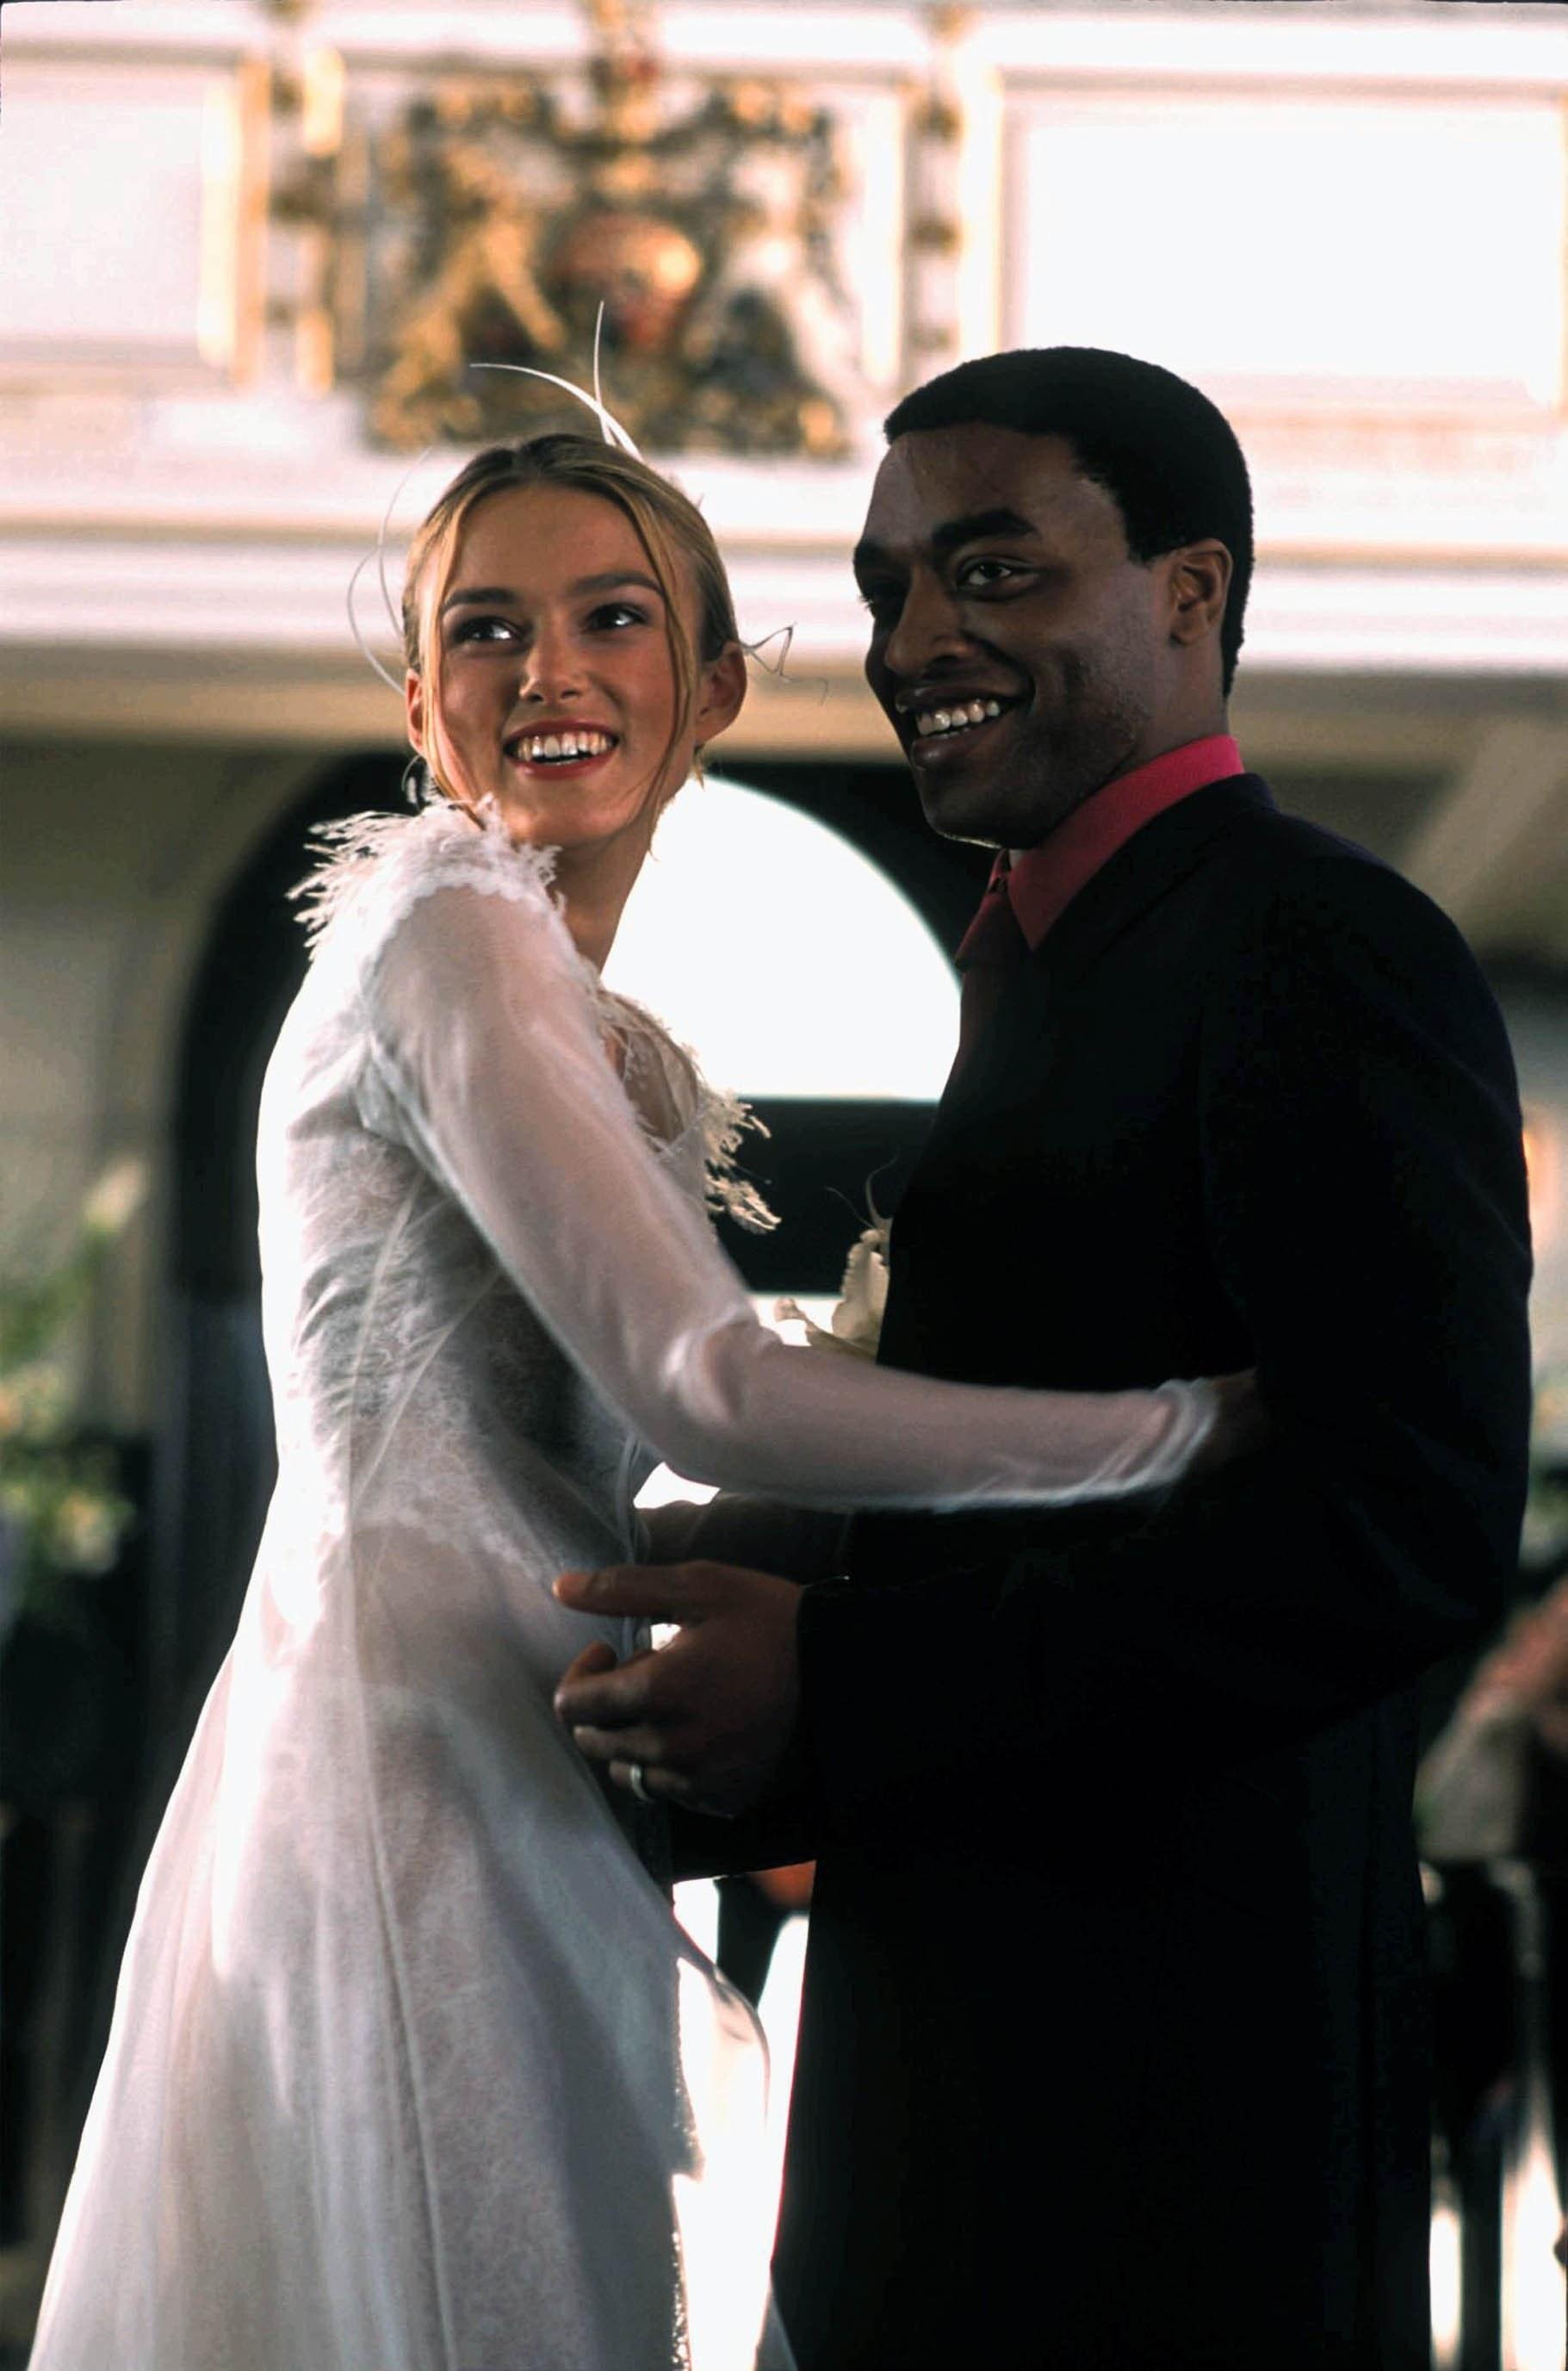 Movie Wedding Dress Ranking